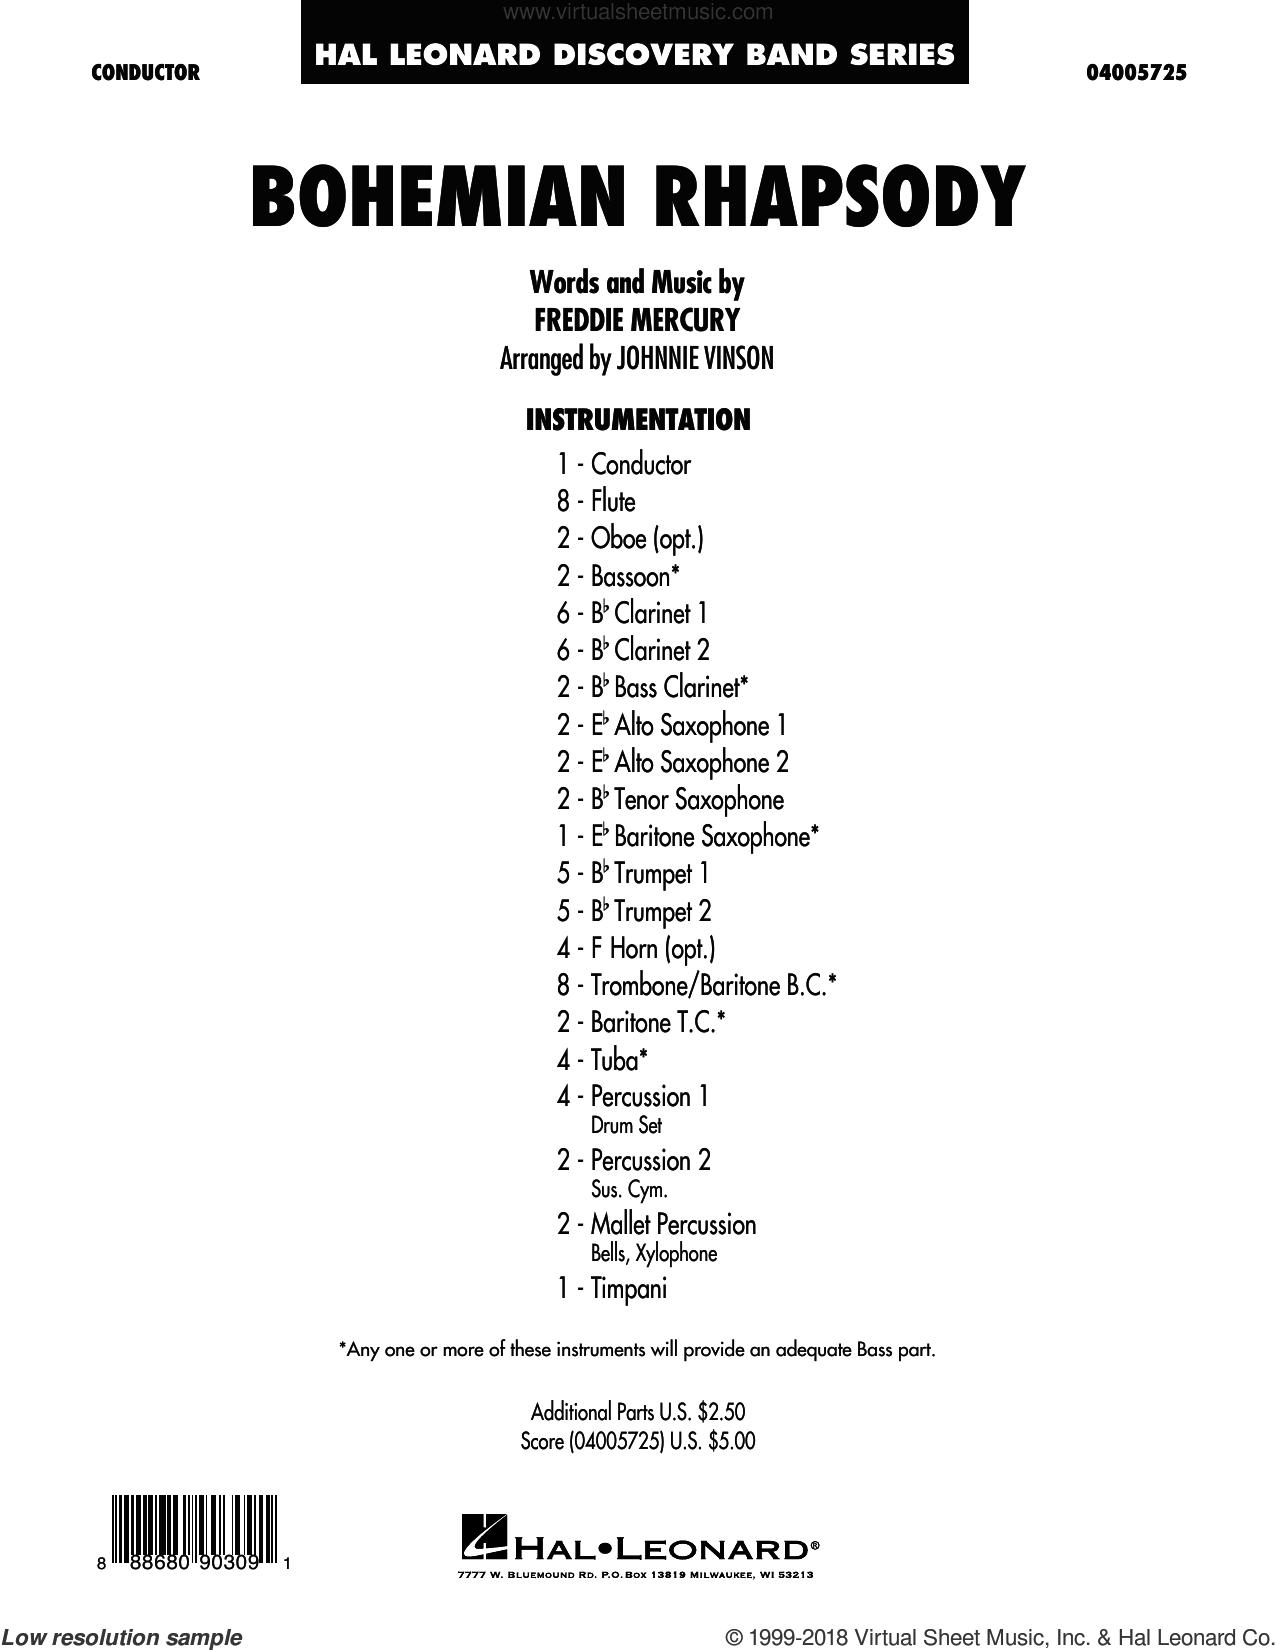 Bohemian Rhapsody (arr. Johnnie Vinson) (COMPLETE) sheet music for concert band by Queen, Freddie Mercury and Johnnie Vinson, intermediate skill level